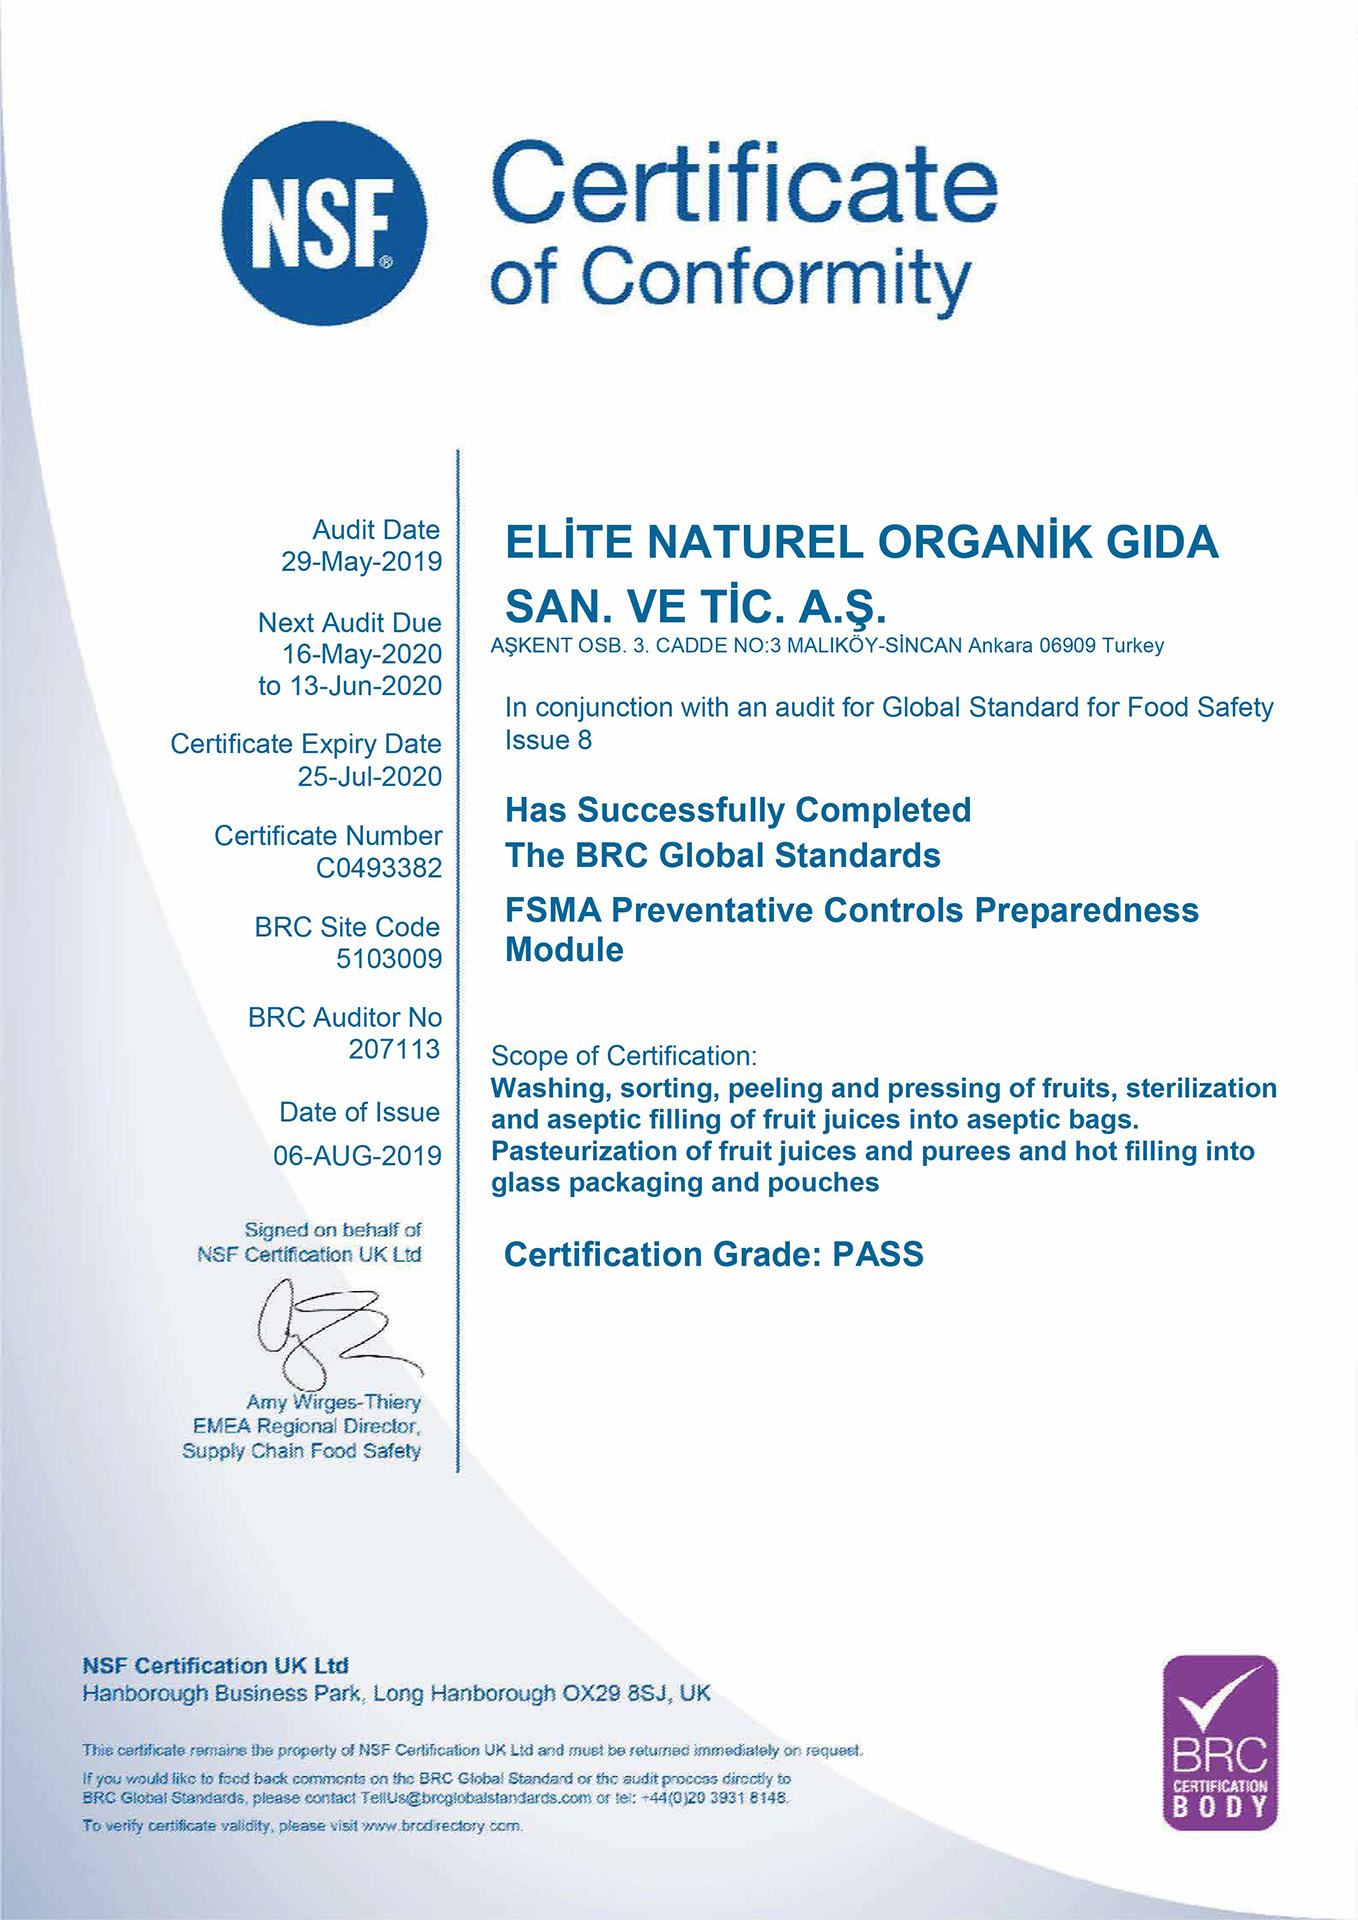 brcbody uluslararasi standart sertifikasi